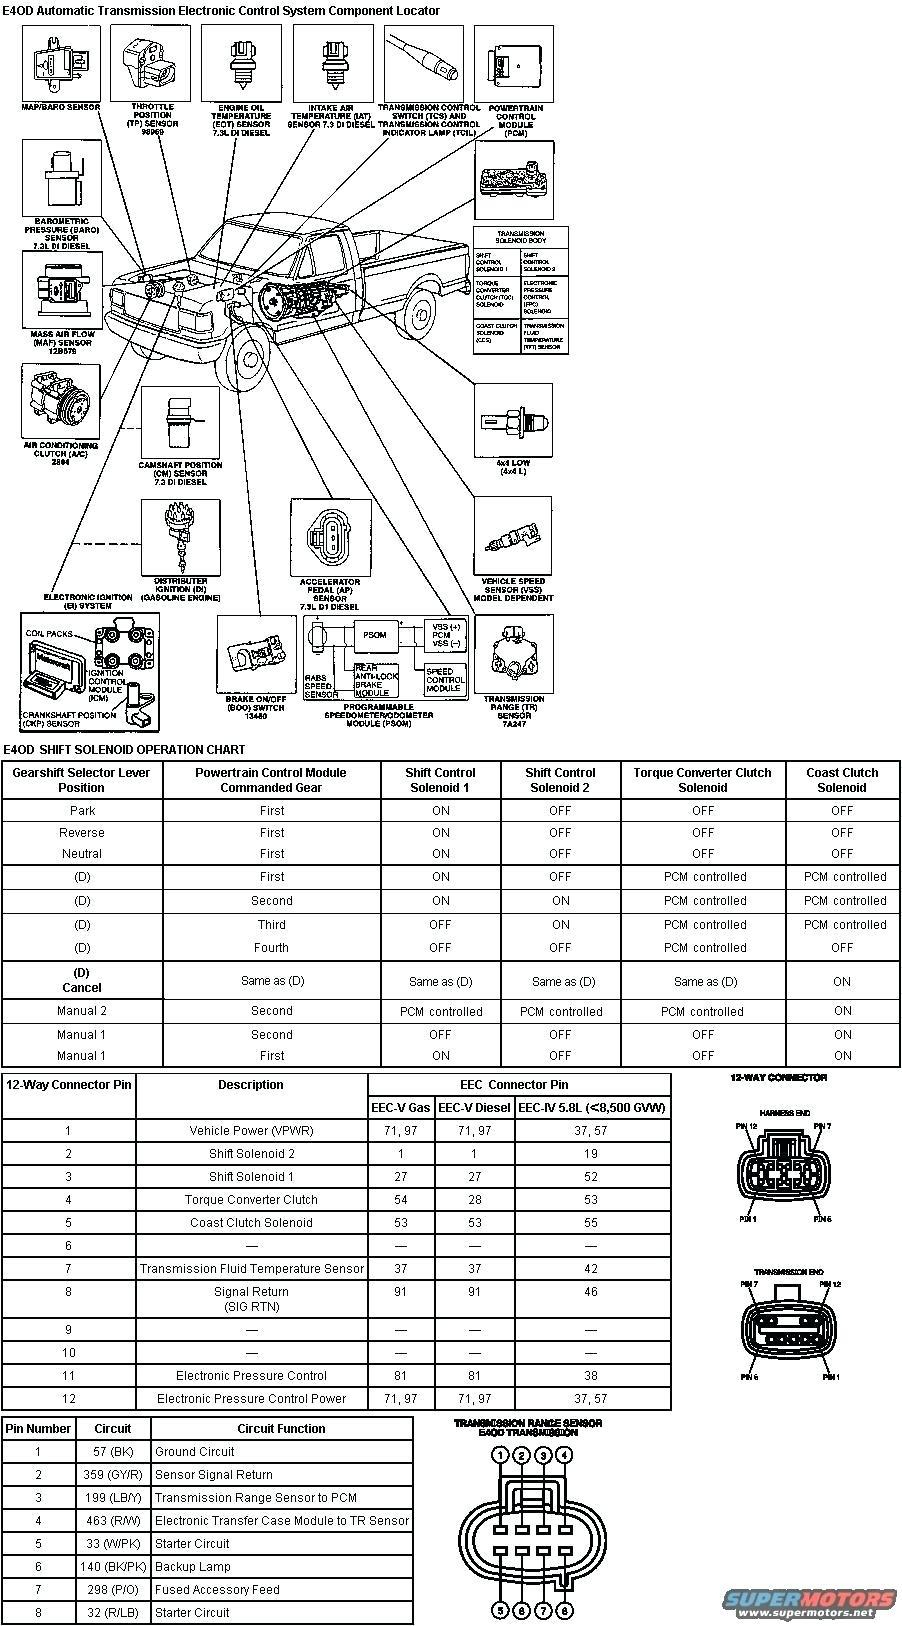 Diagram Ford Diagrams File Gj50607 - 4R70W Transmission Wiring Diagram